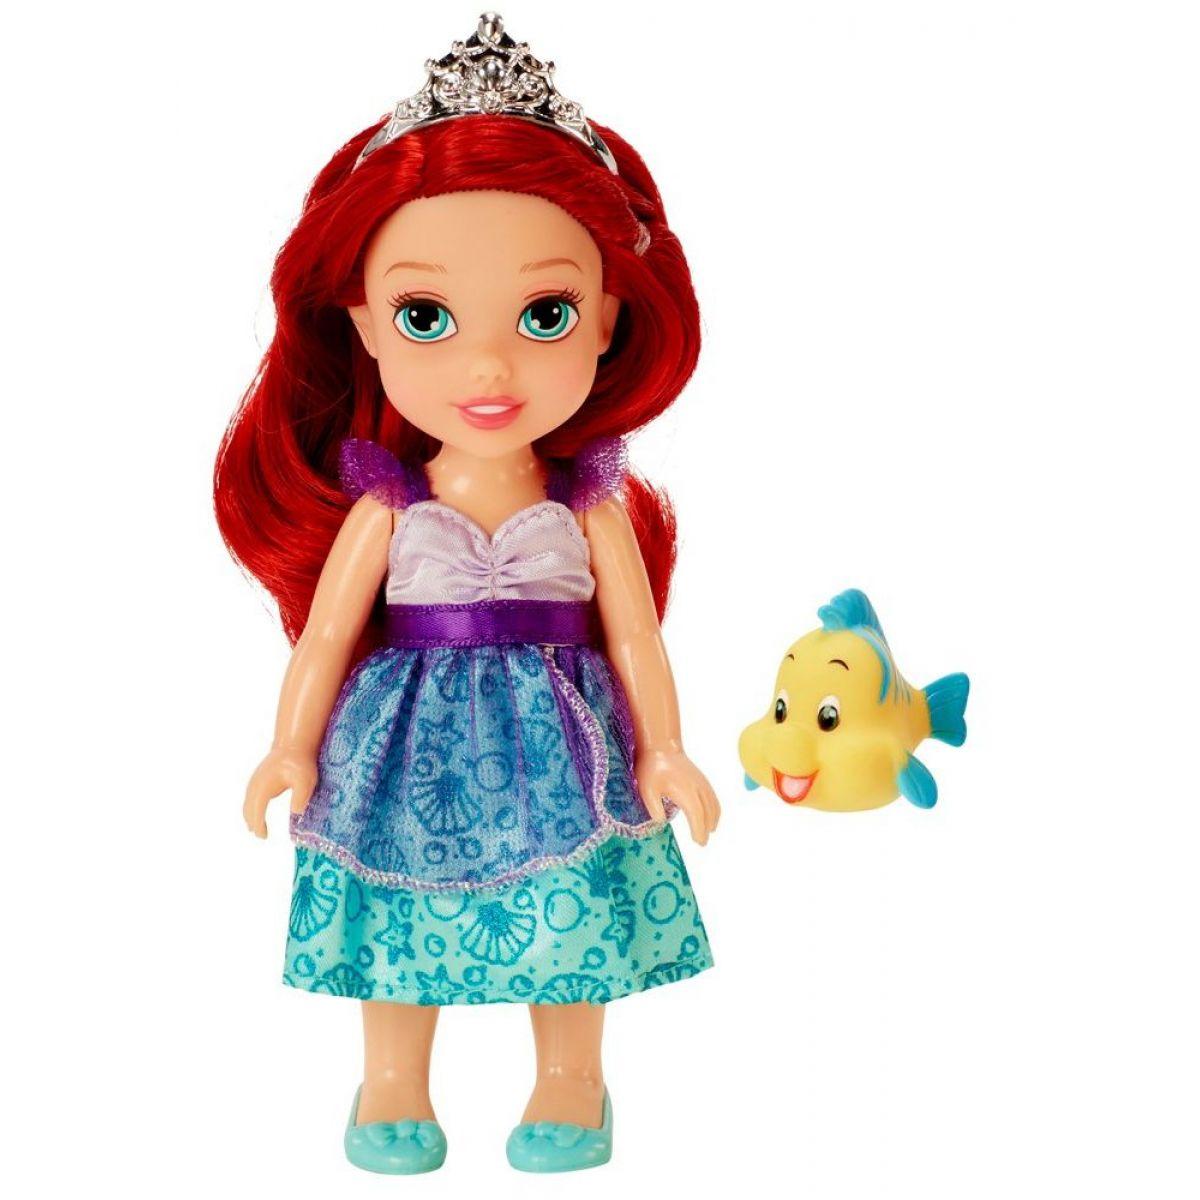 ADC Blackfire Disney Princess Princezna Ariel 15 cm a kamarád